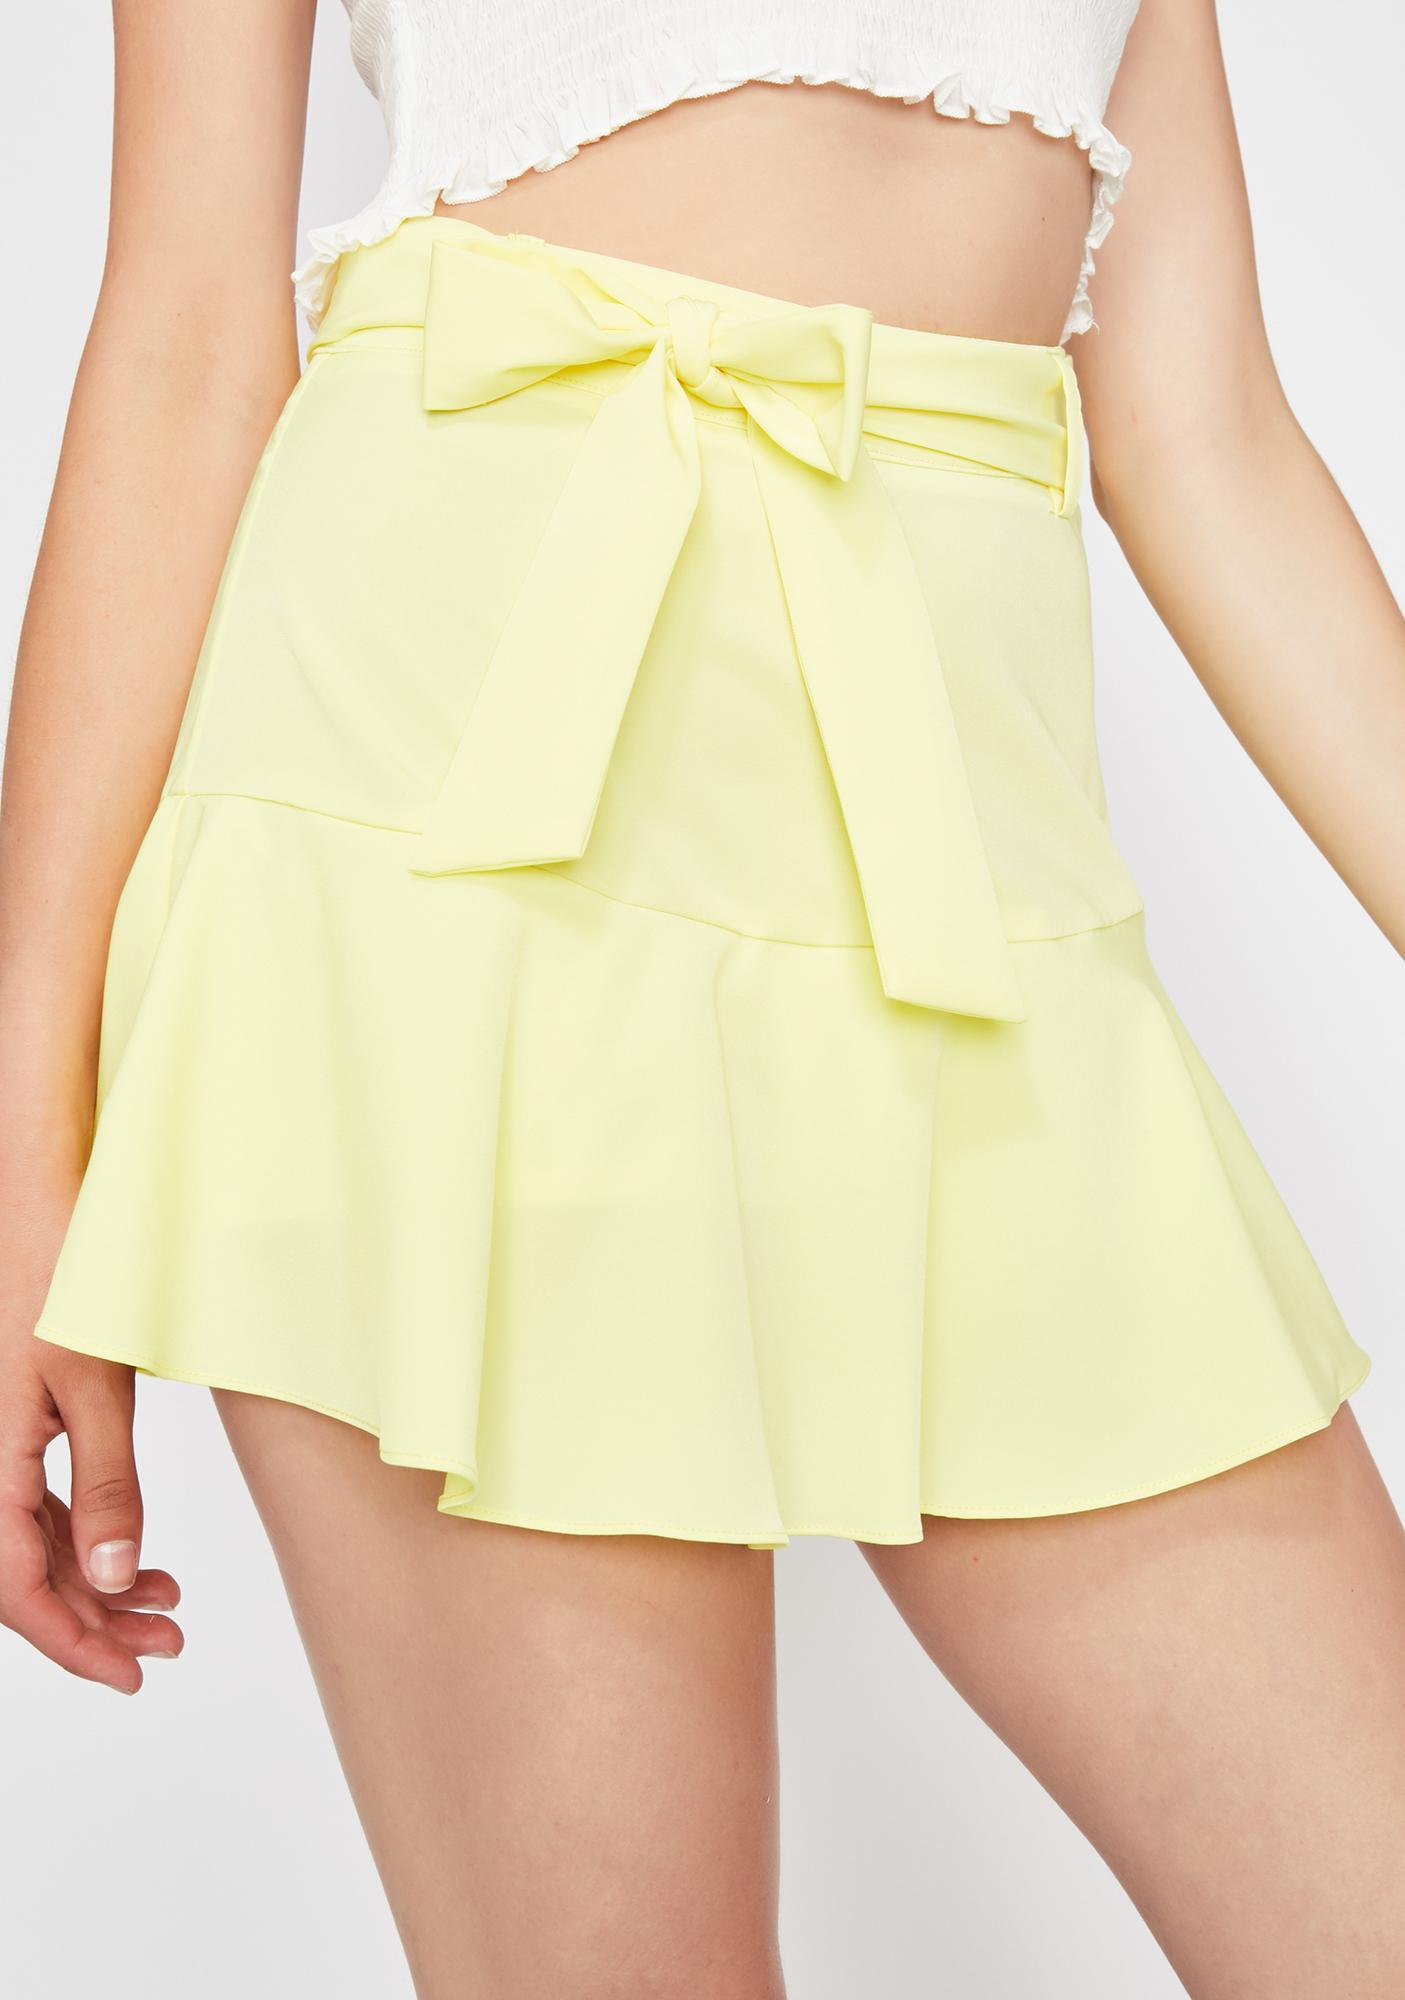 Sour Cute Confessions Mini Skirt